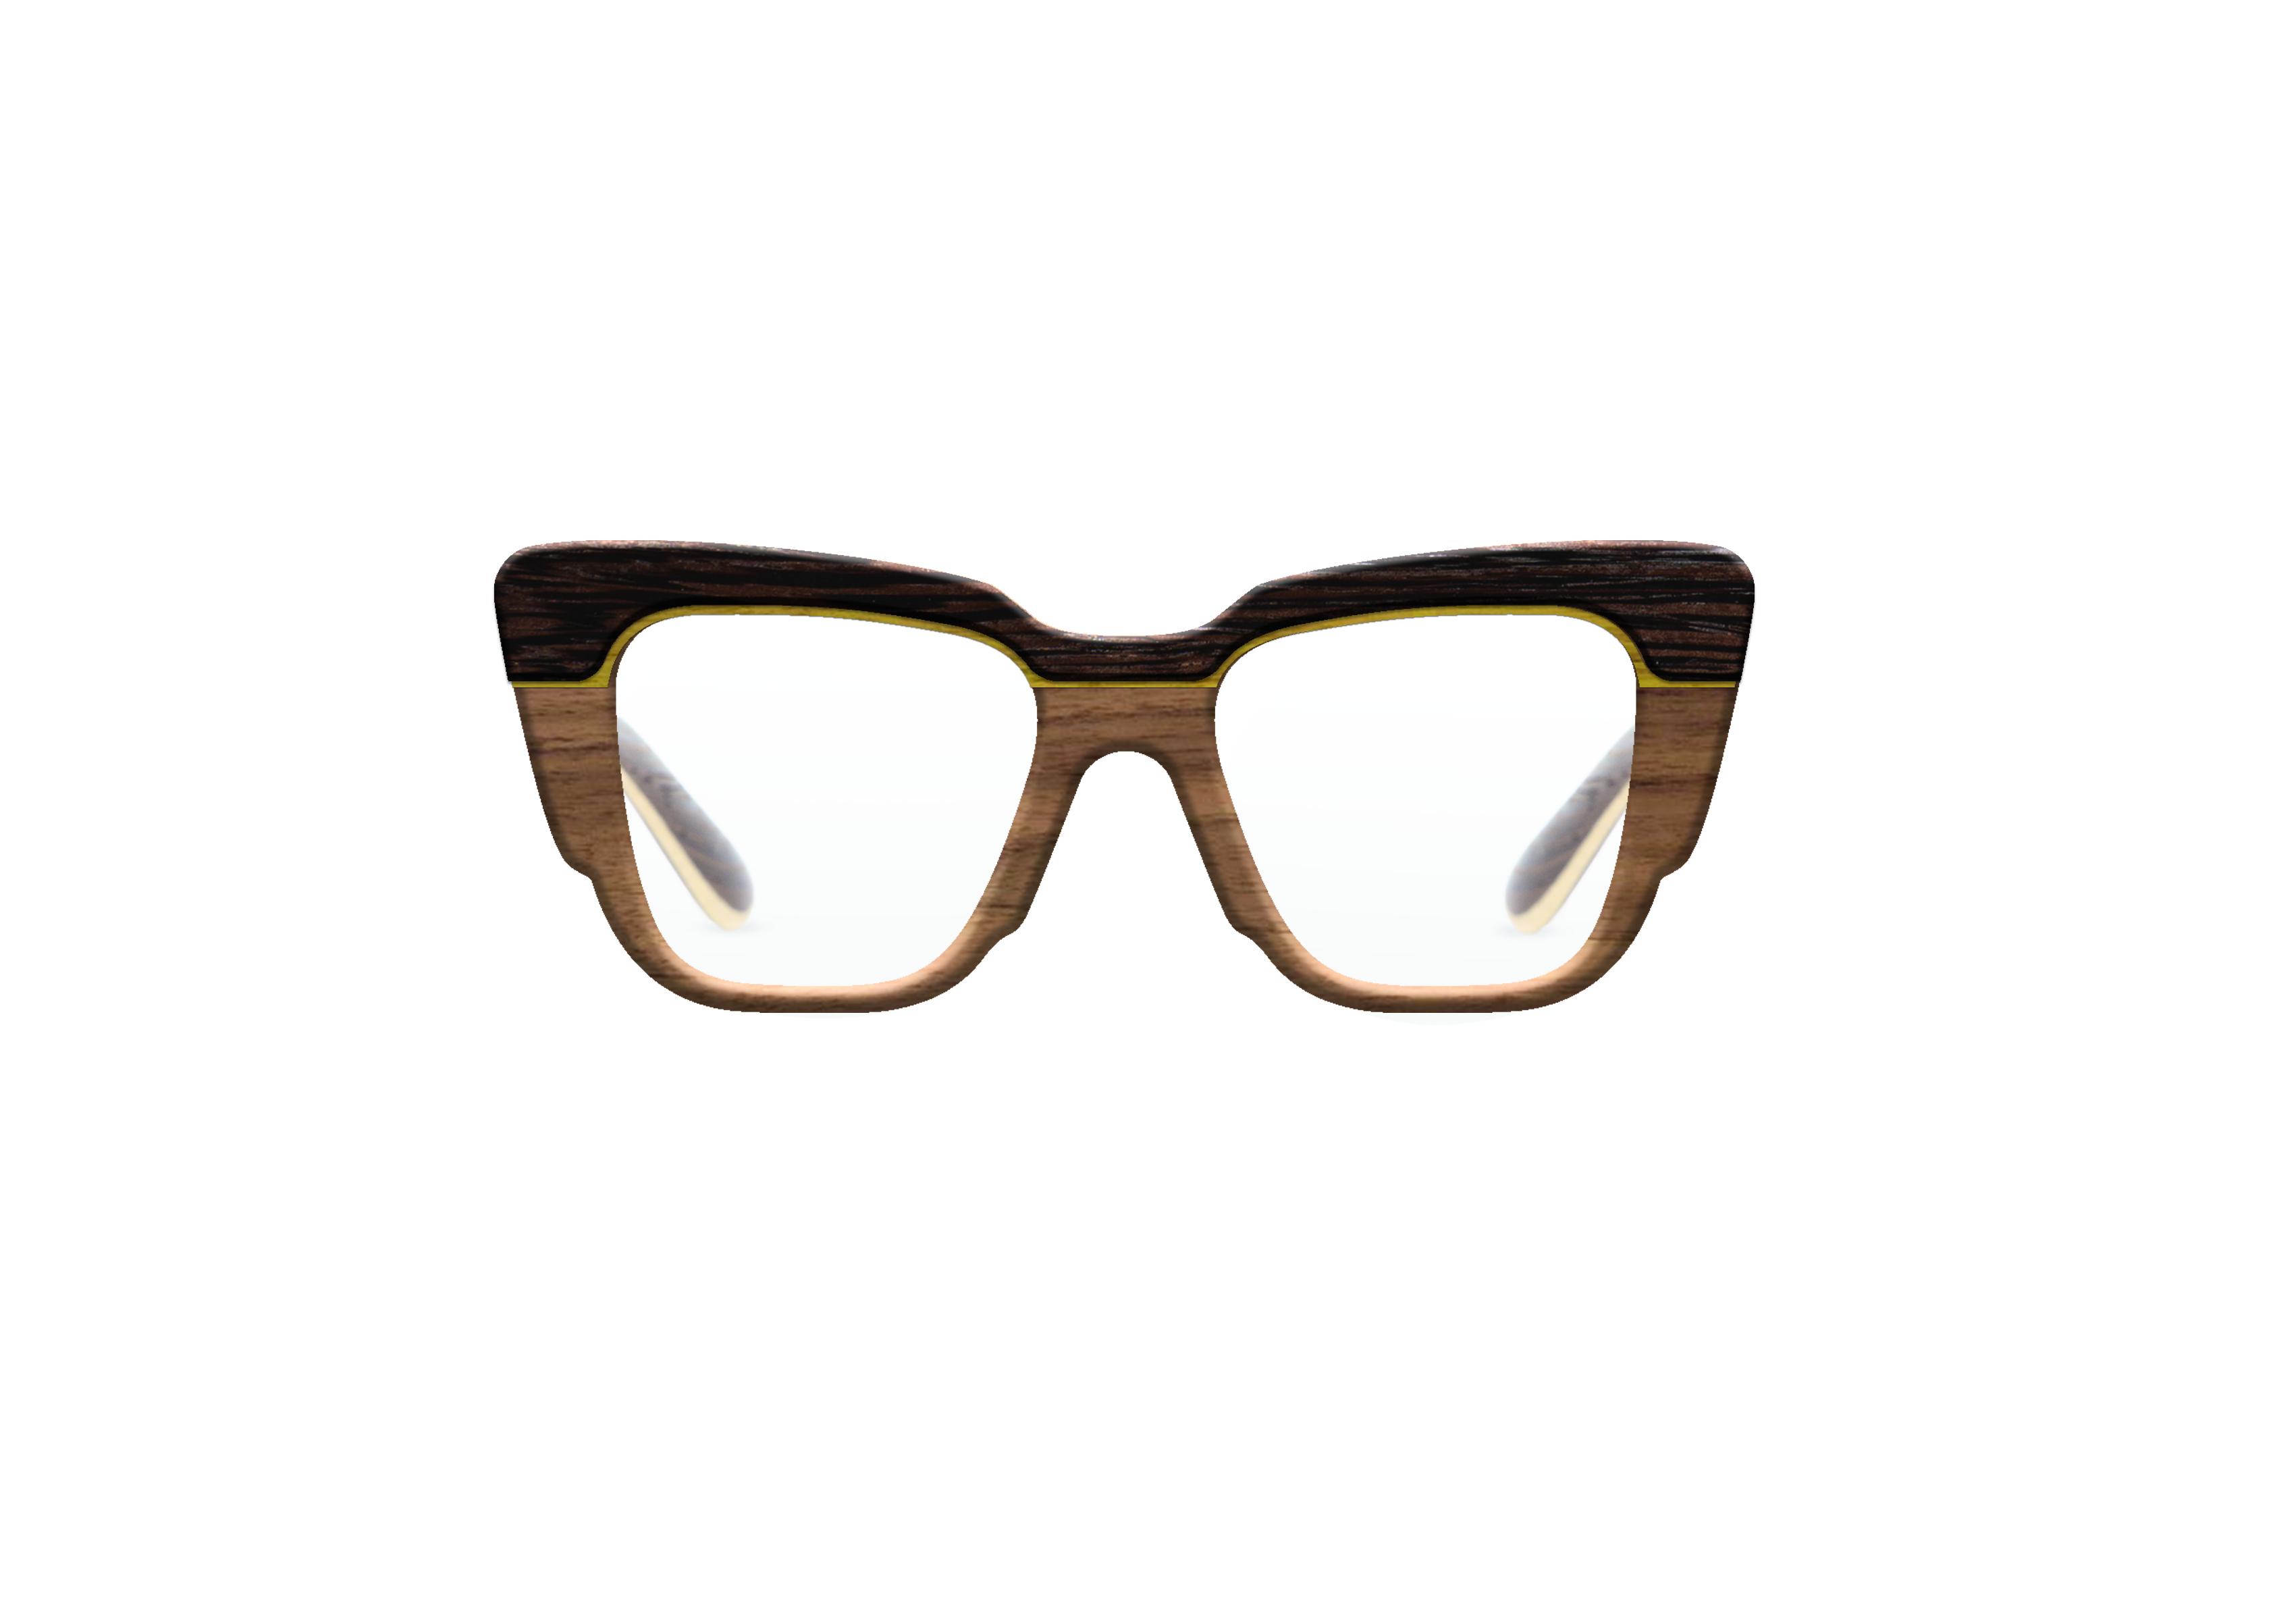 Phoenix VAKAY handmade wooden eyewear